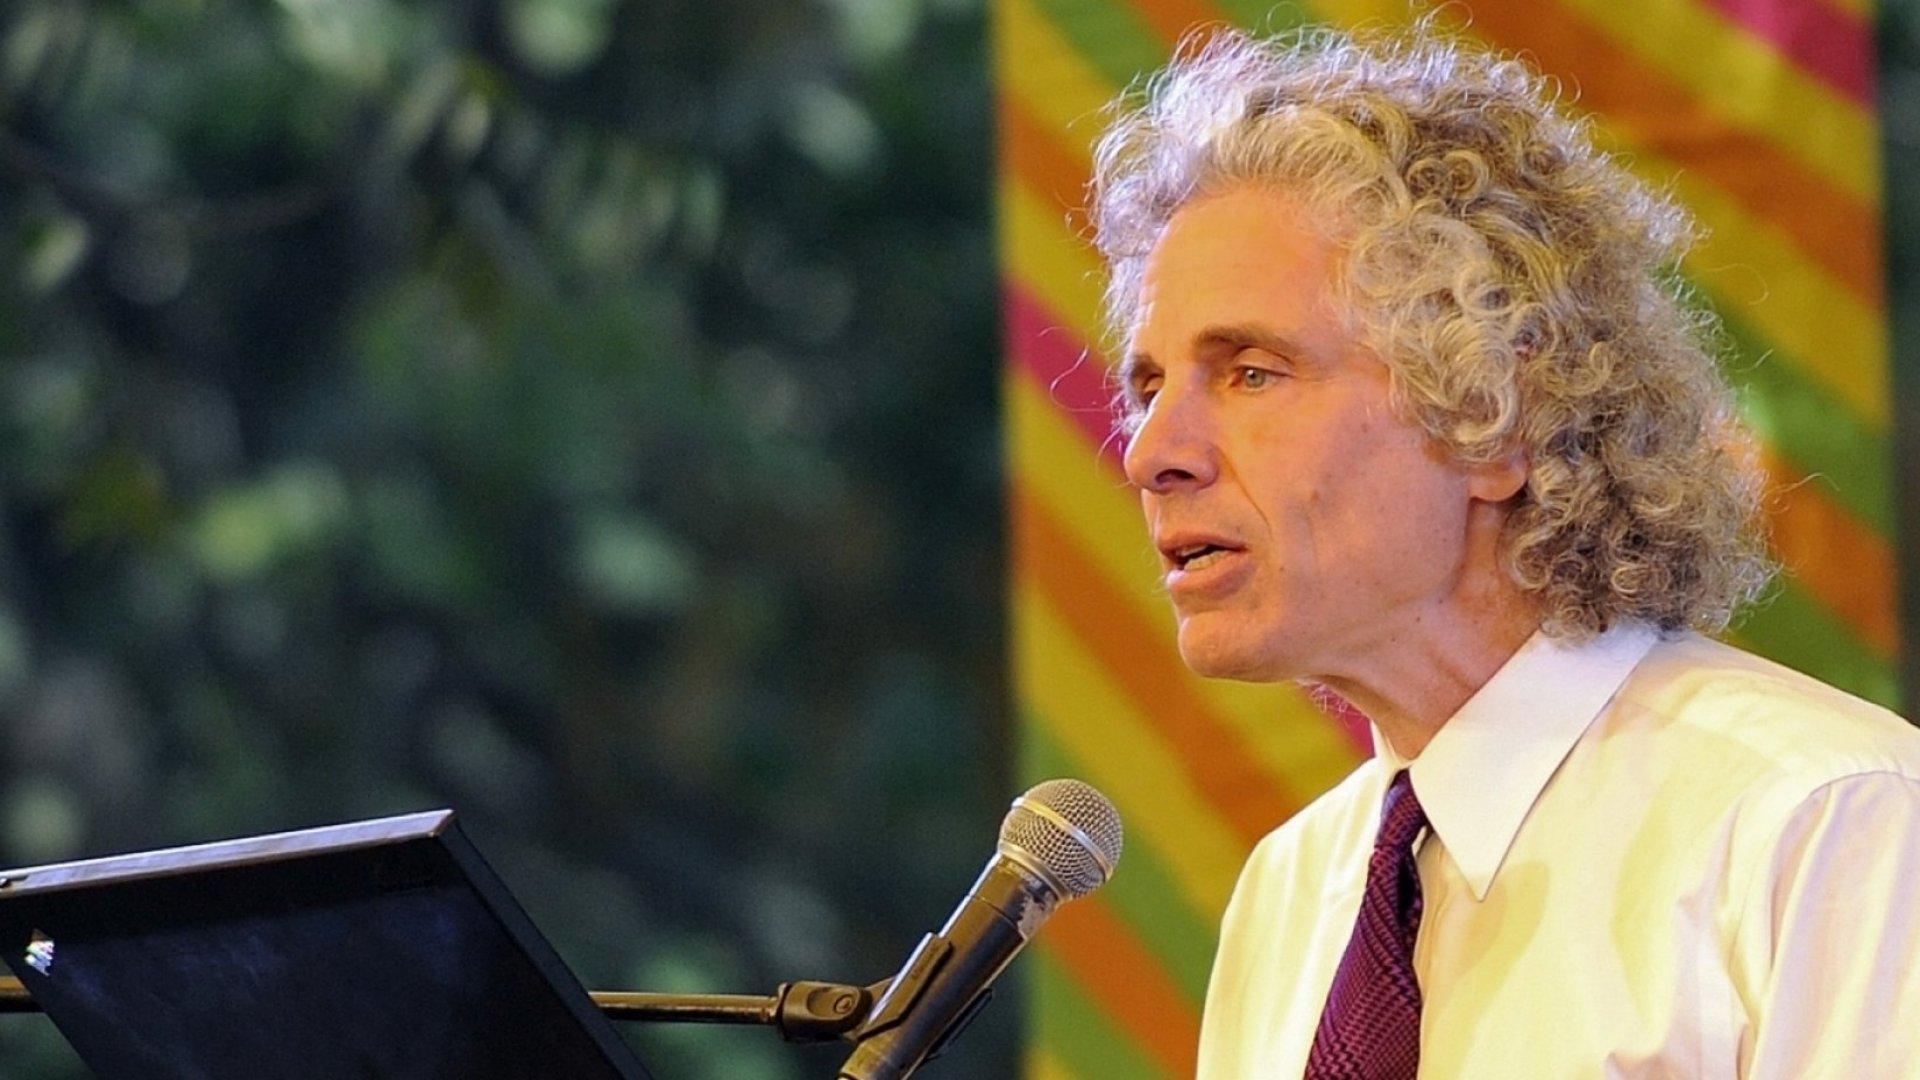 Steven Pinker,Enlightenment Now, and Leadership